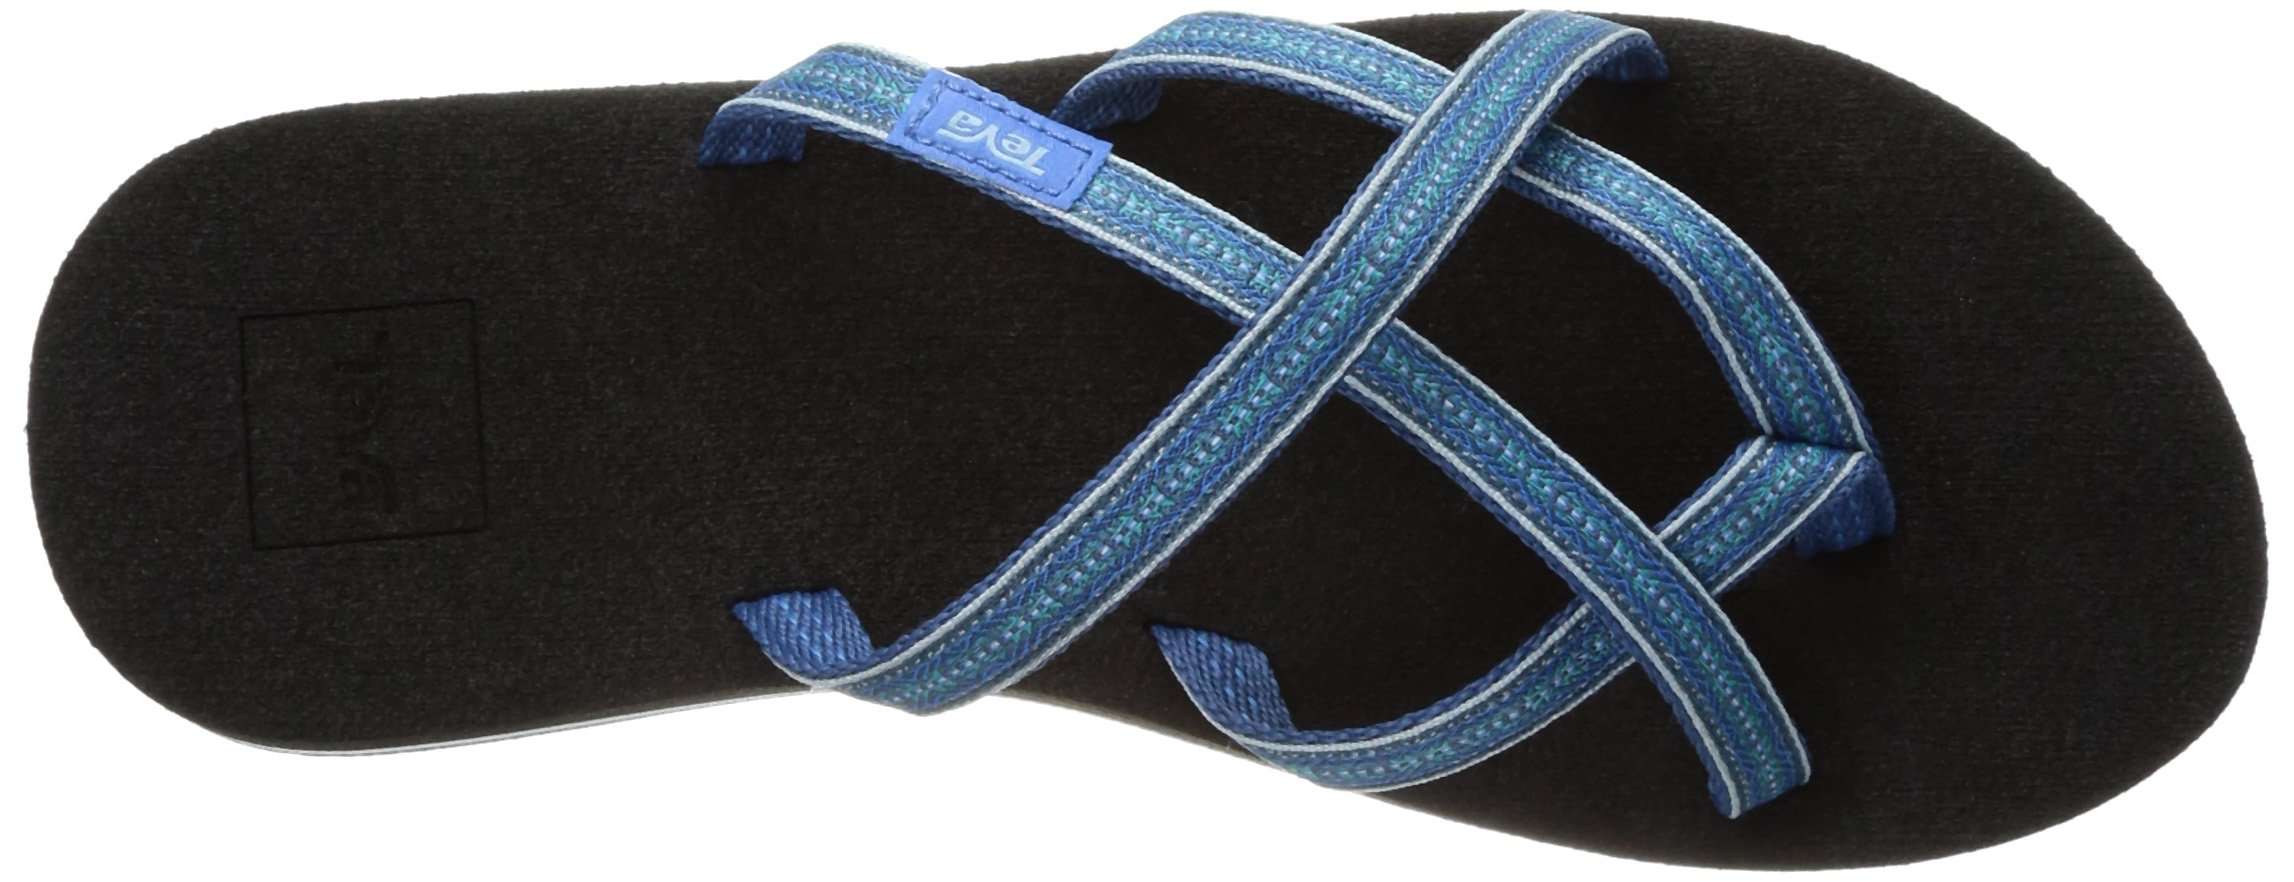 f044cfd8c Teva Women s Olowahu Flip-Flop - 9 B(M) US - Pintado Blue - 8761 770  pintado blue   Flip-Flops   Clothing